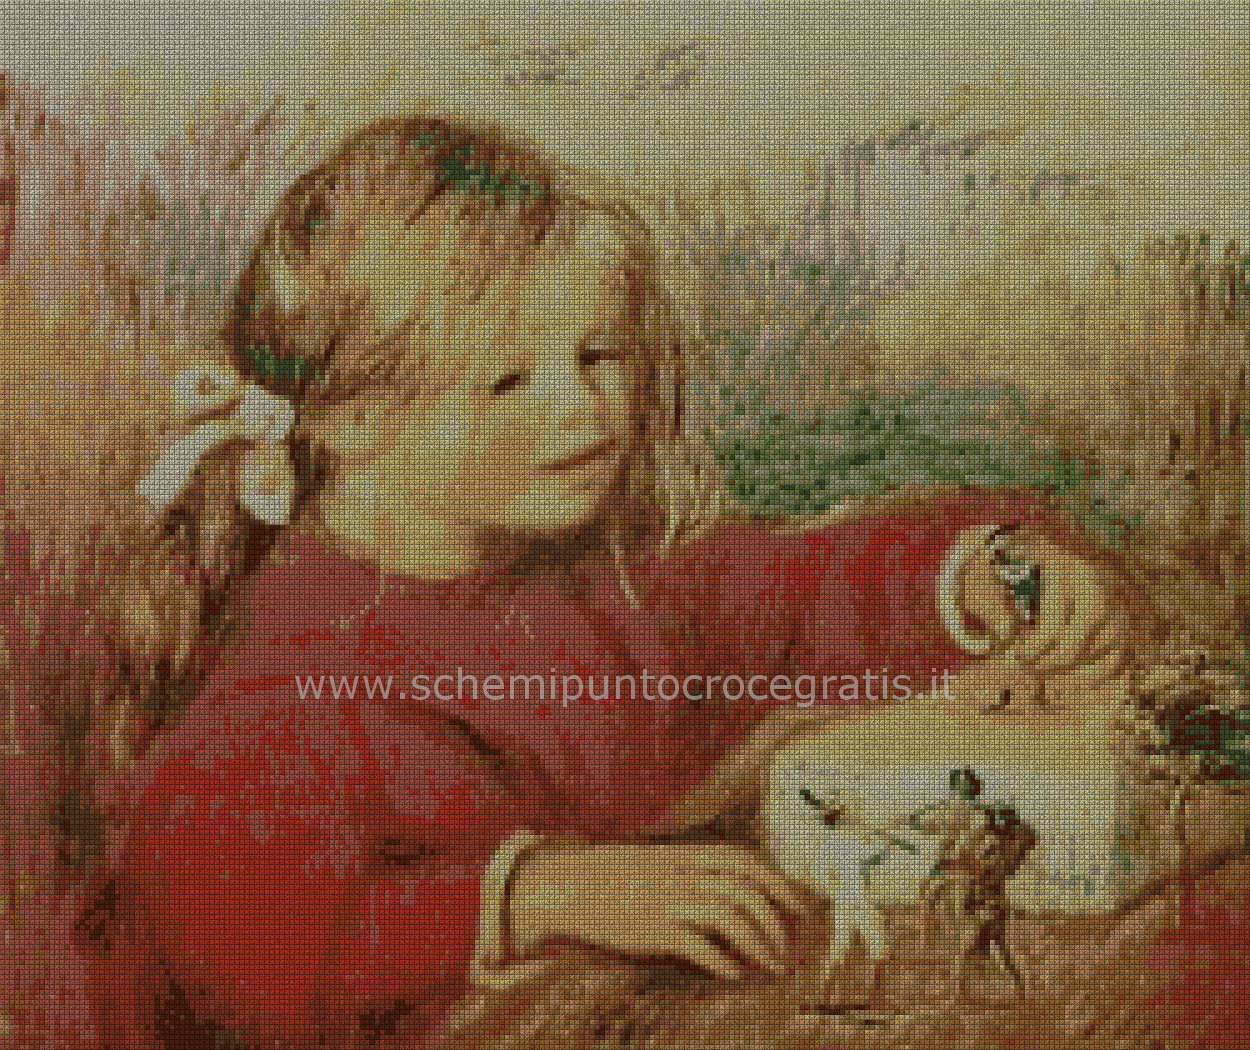 pittori_moderni/renoir/Renoir27.jpg